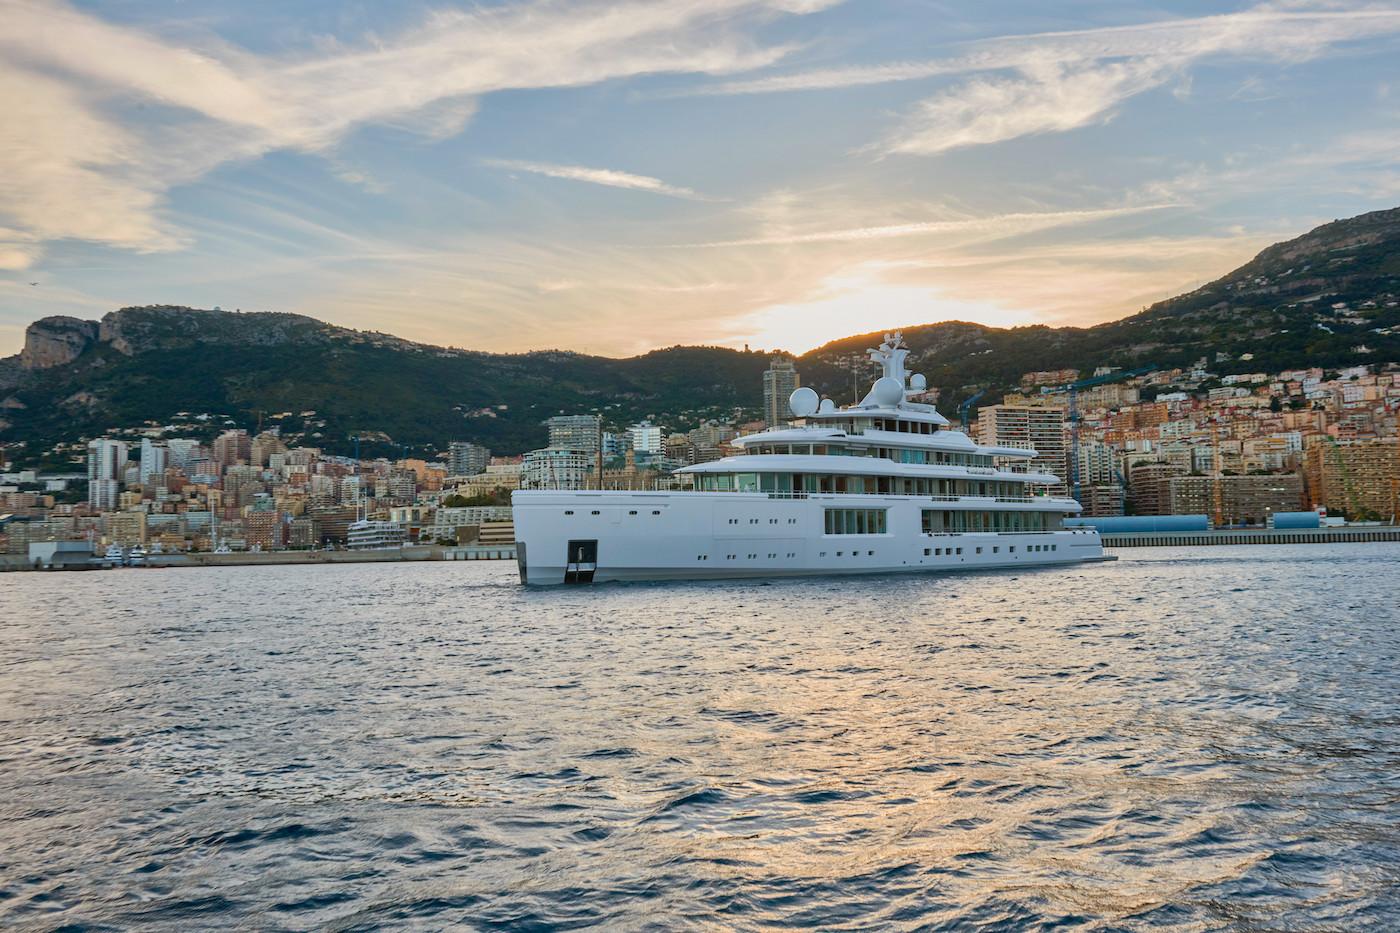 Benetti FB 272 superyacht Luminosity in Monaco 2021